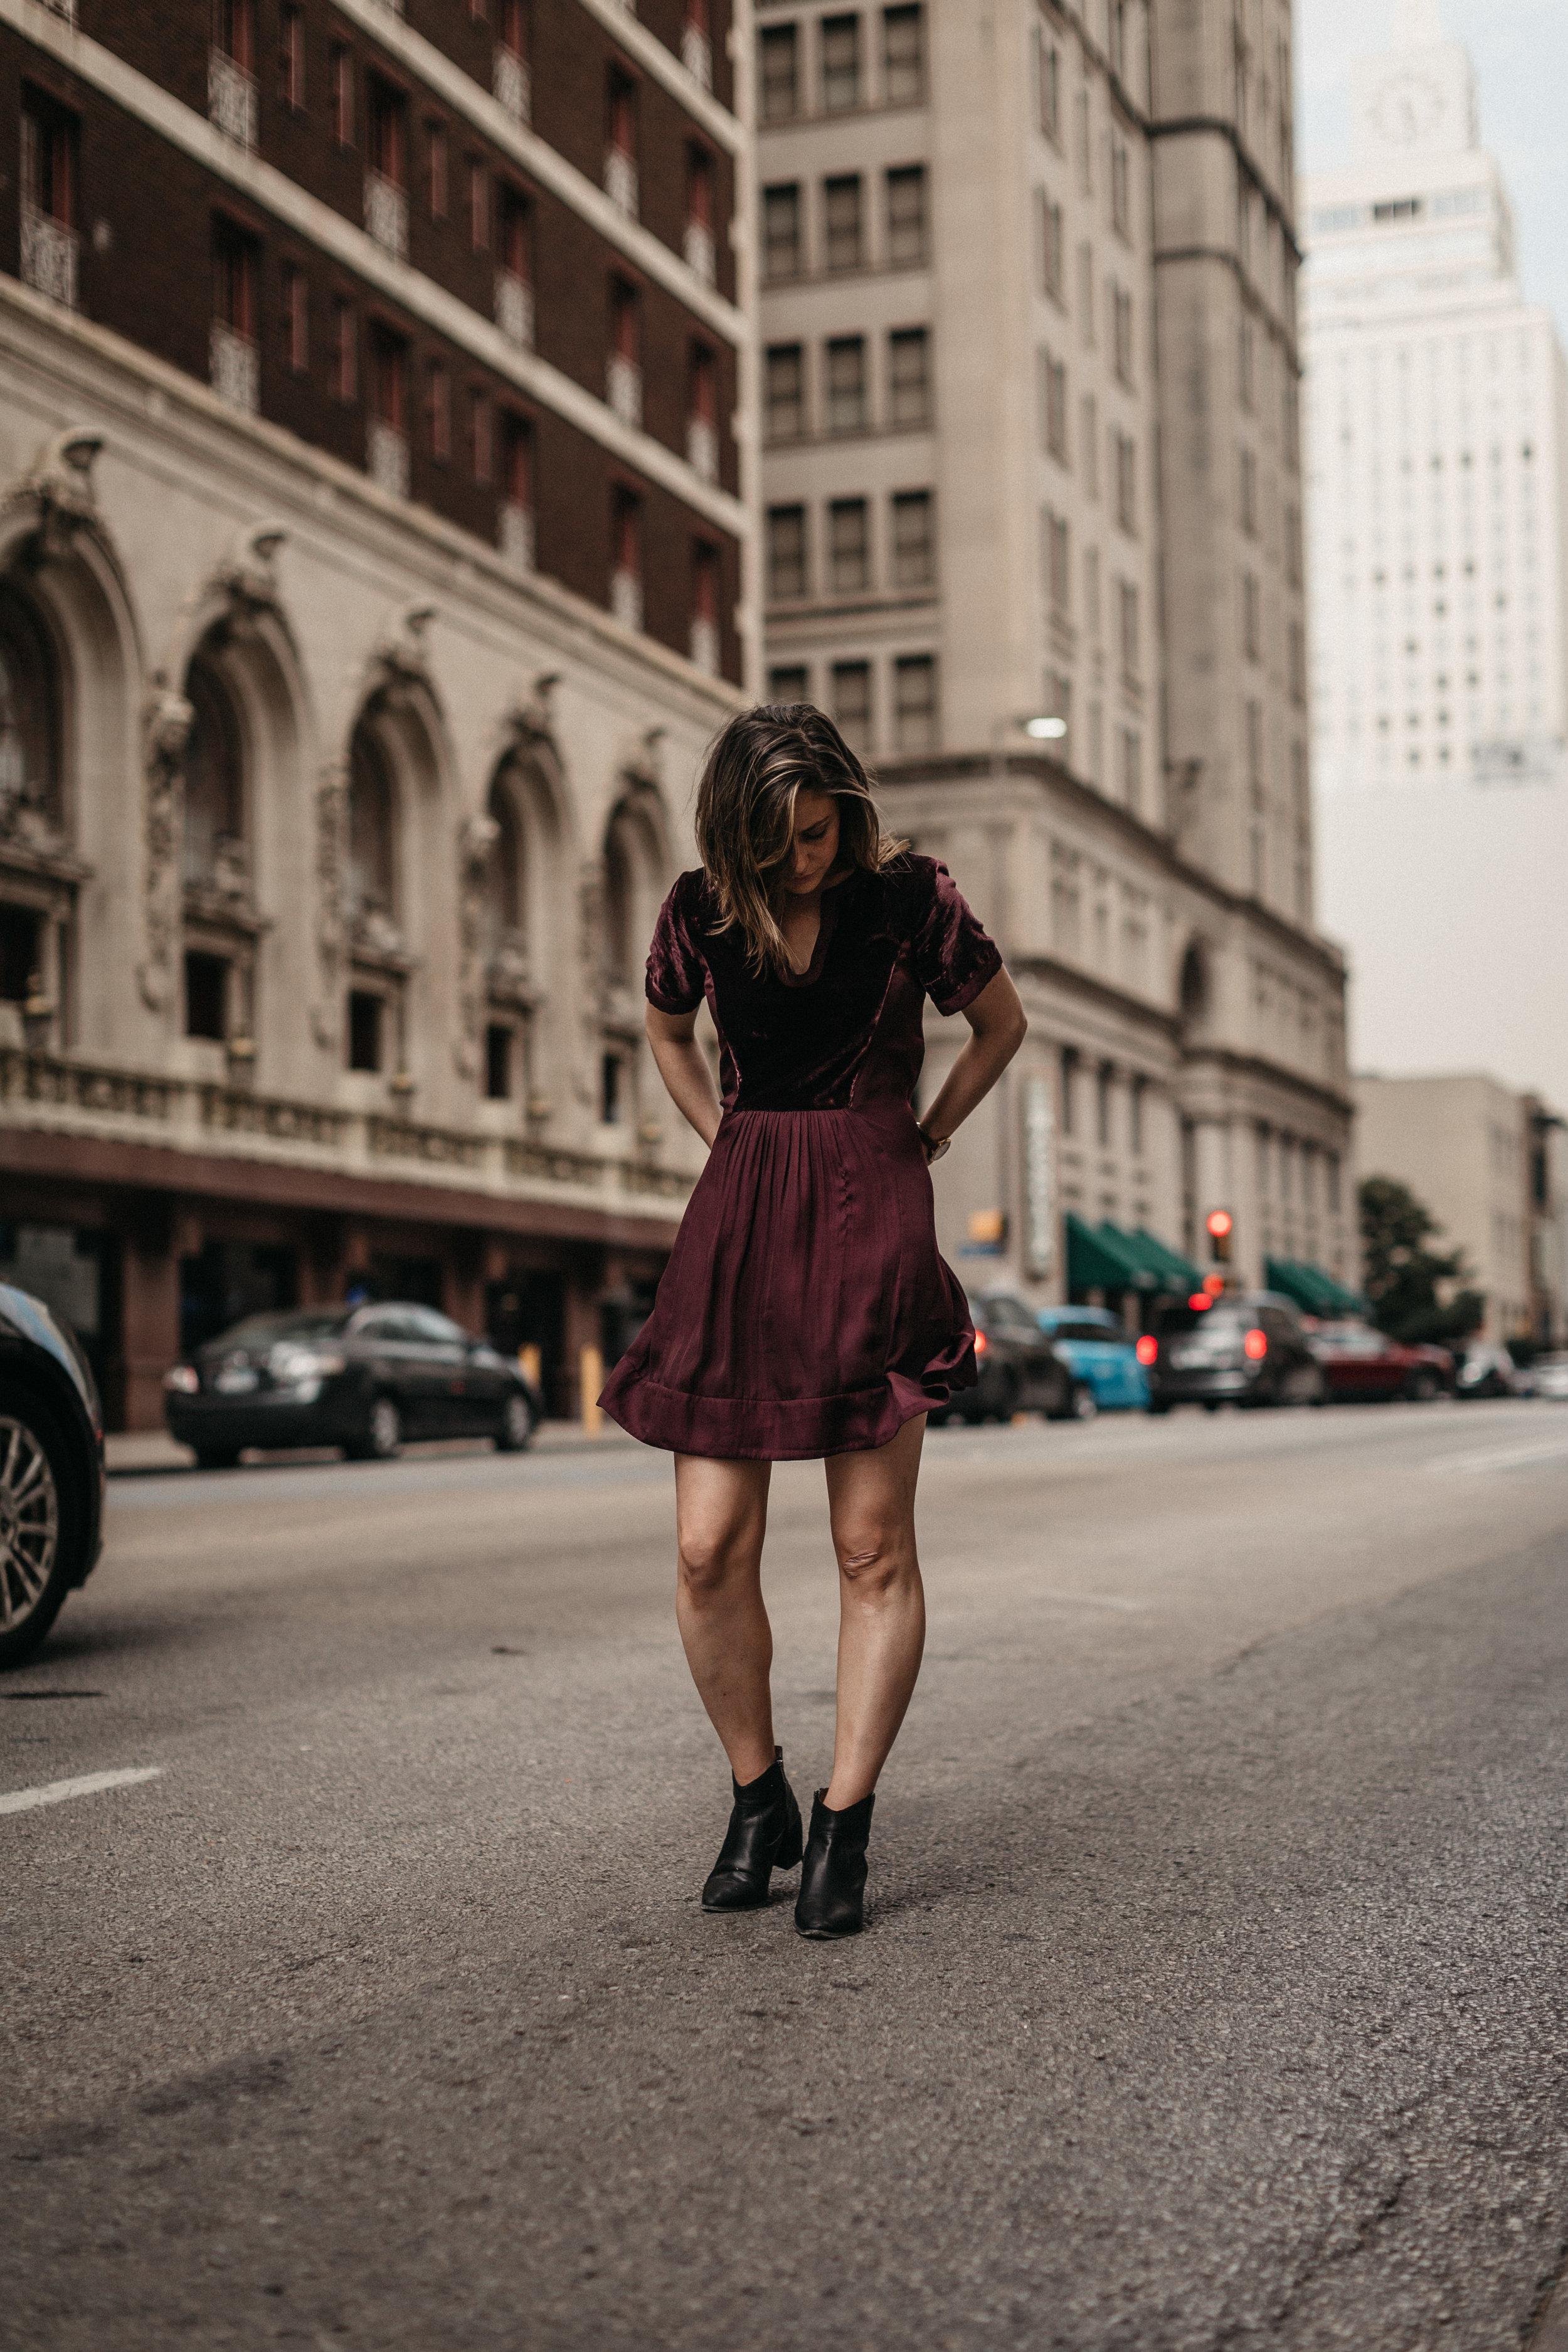 downtownsept-1.jpg